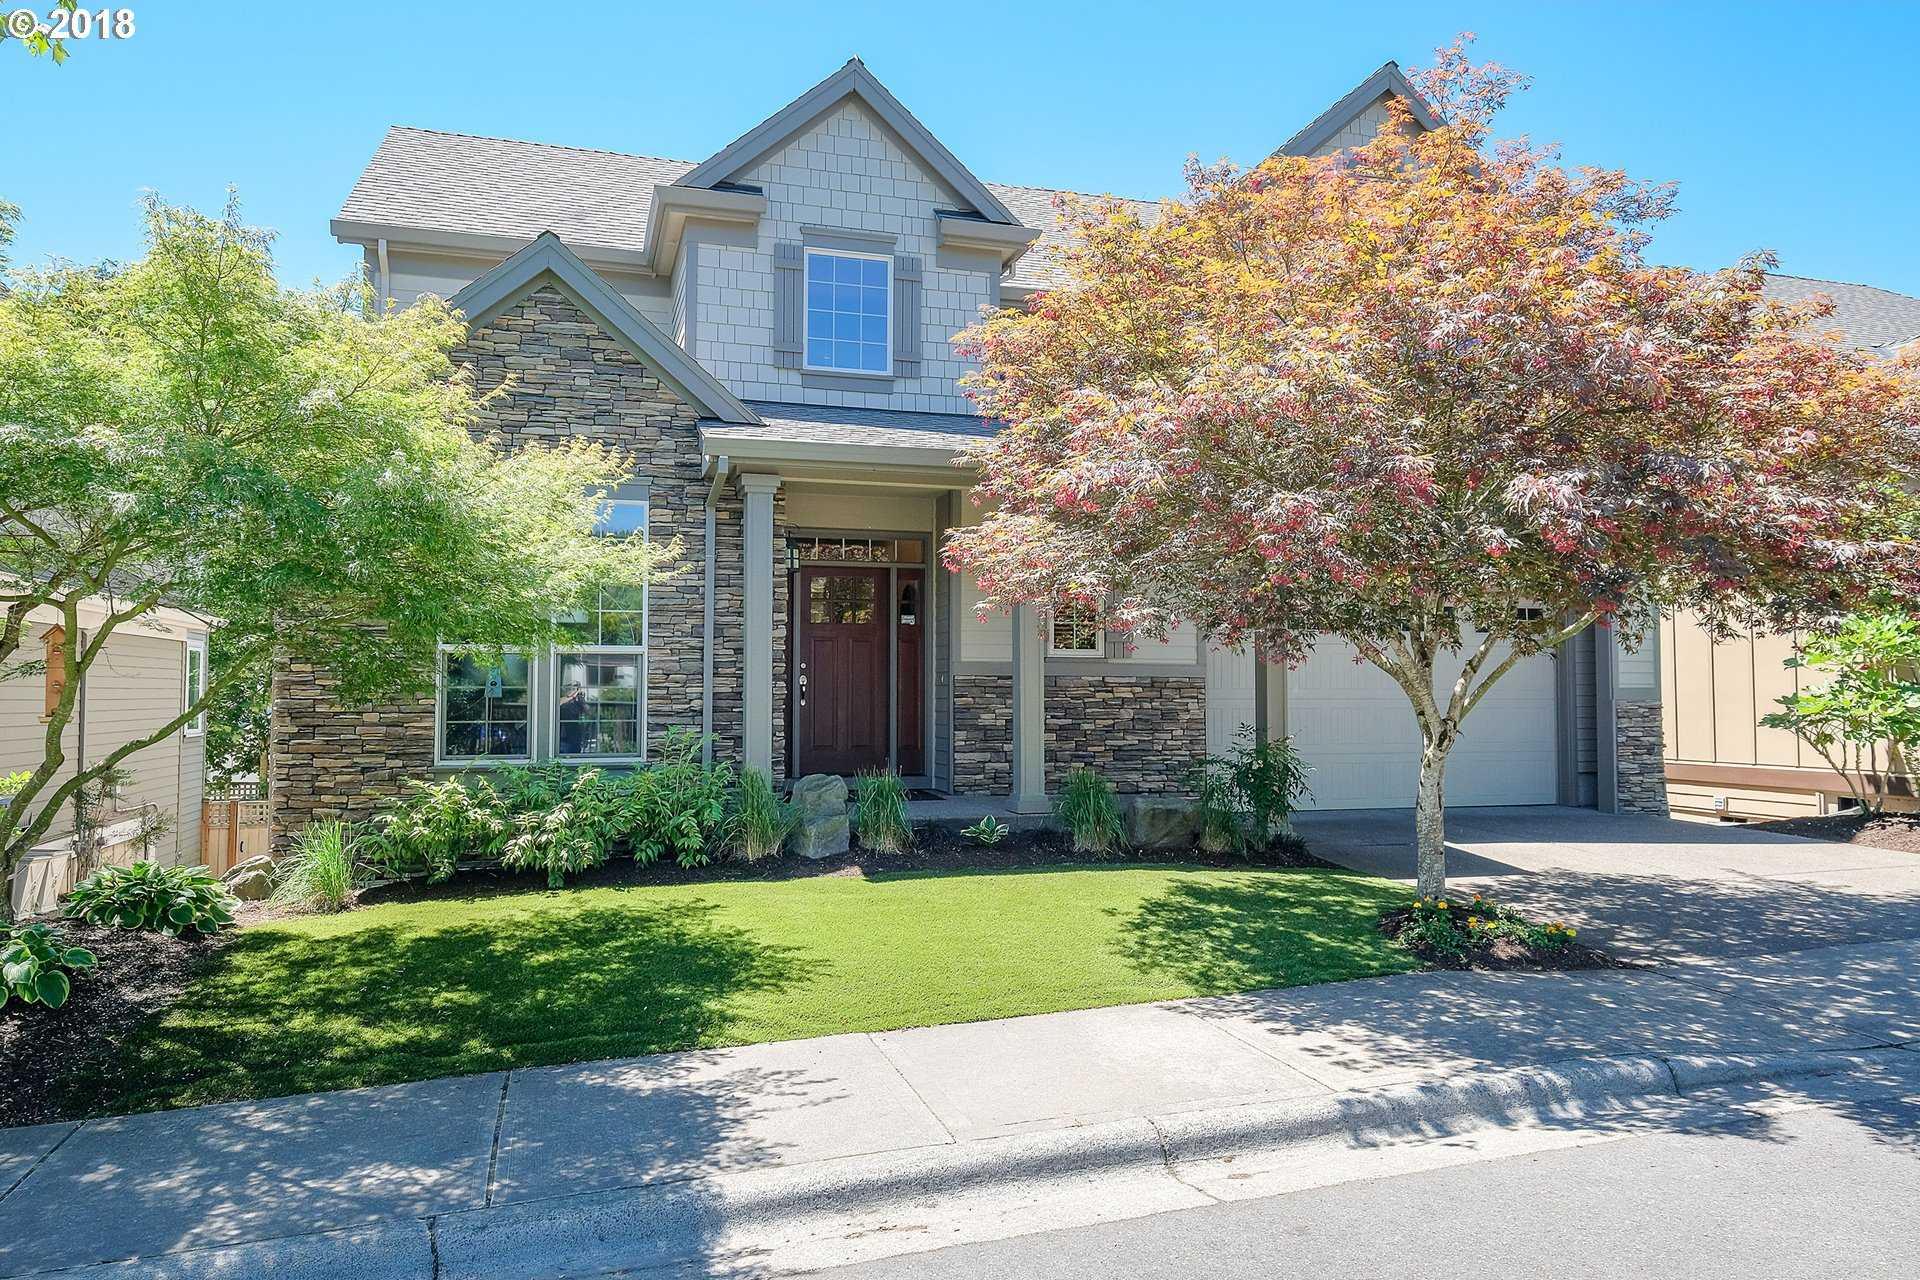 $609,900 - 4Br/3Ba -  for Sale in Thompson Meadows, Portland